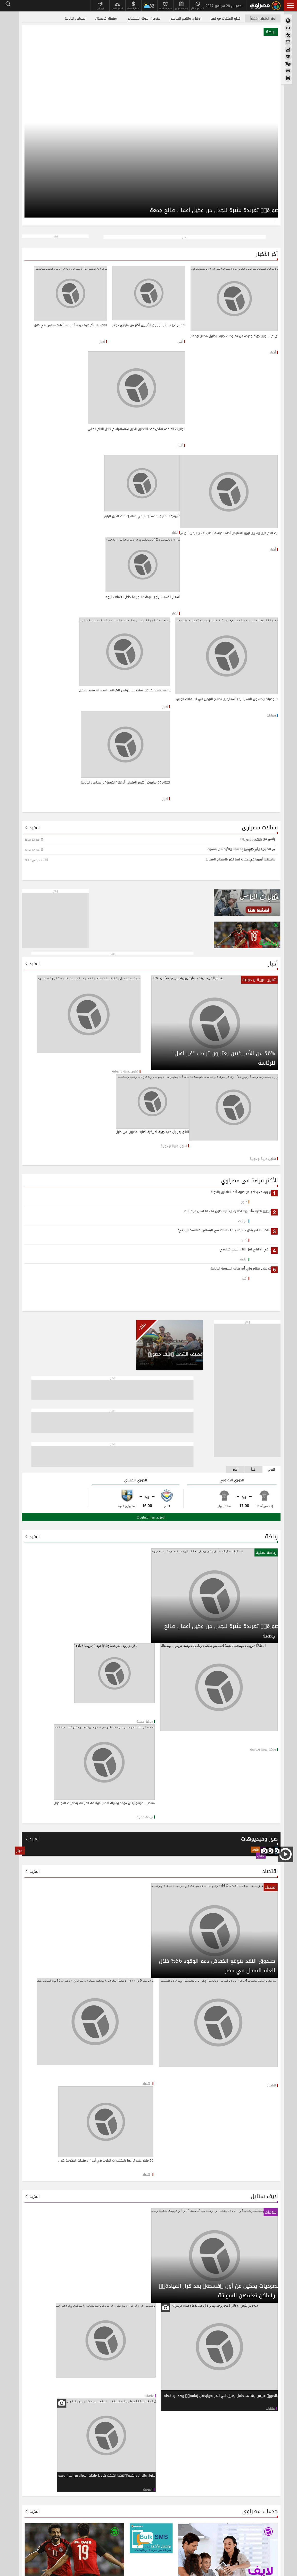 Masrawy at Thursday Sept. 28, 2017, 5:07 a.m. UTC